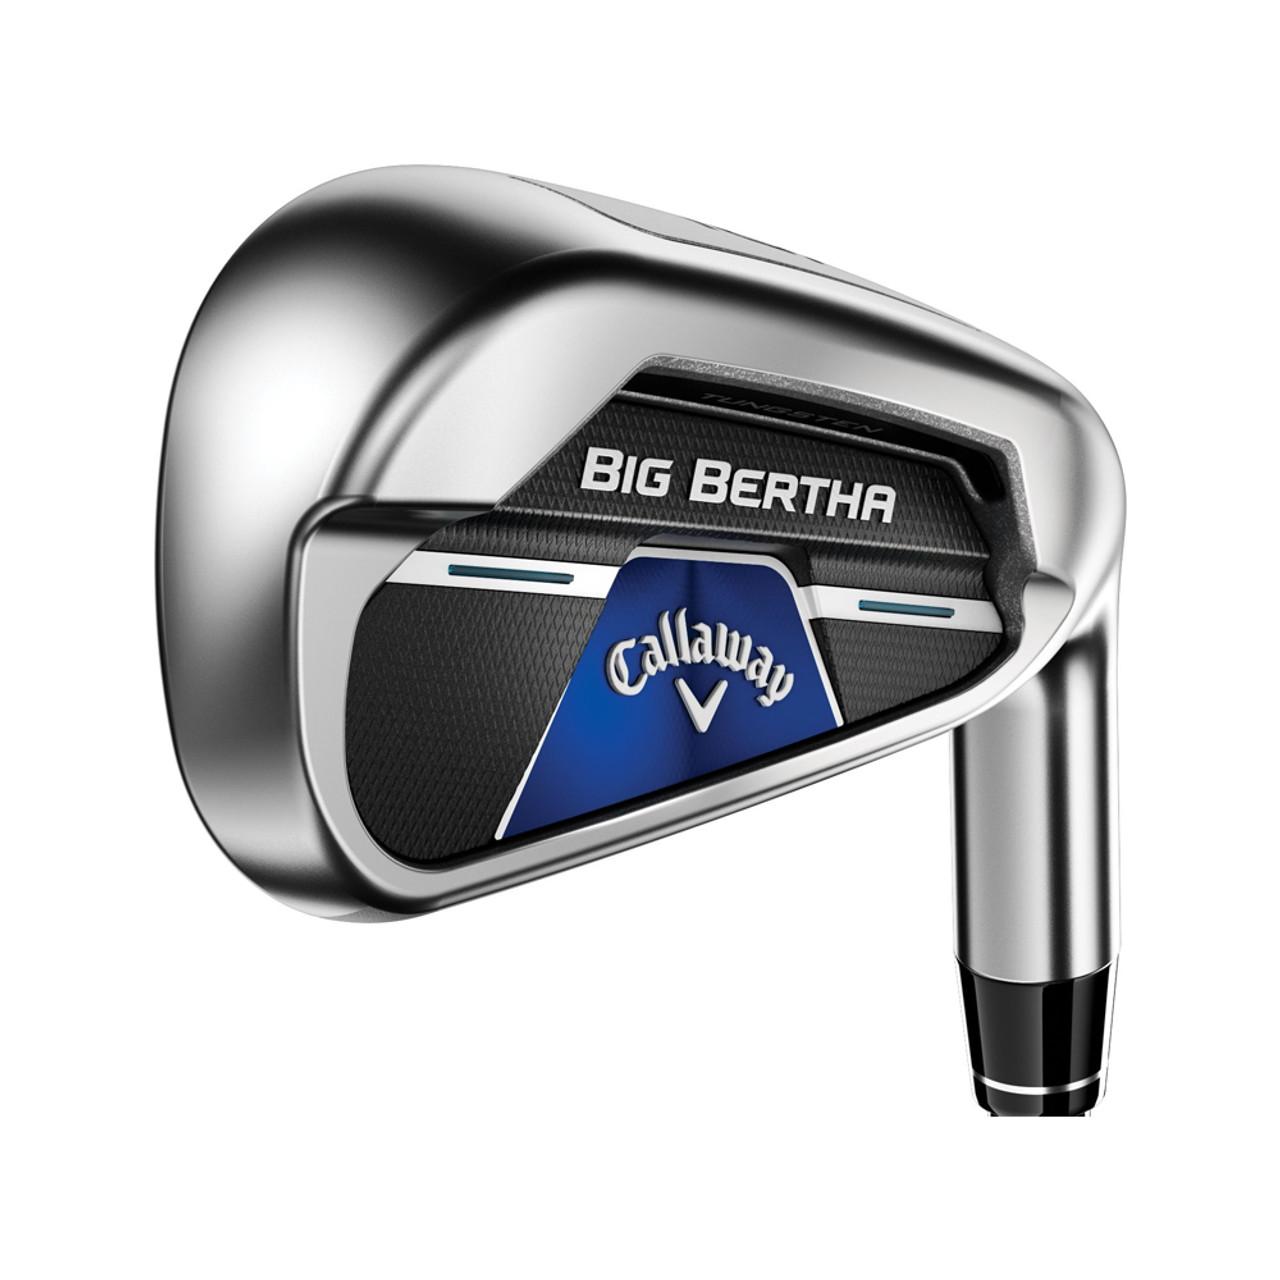 Callaway Big Bertha B21 Combo Iron Sets